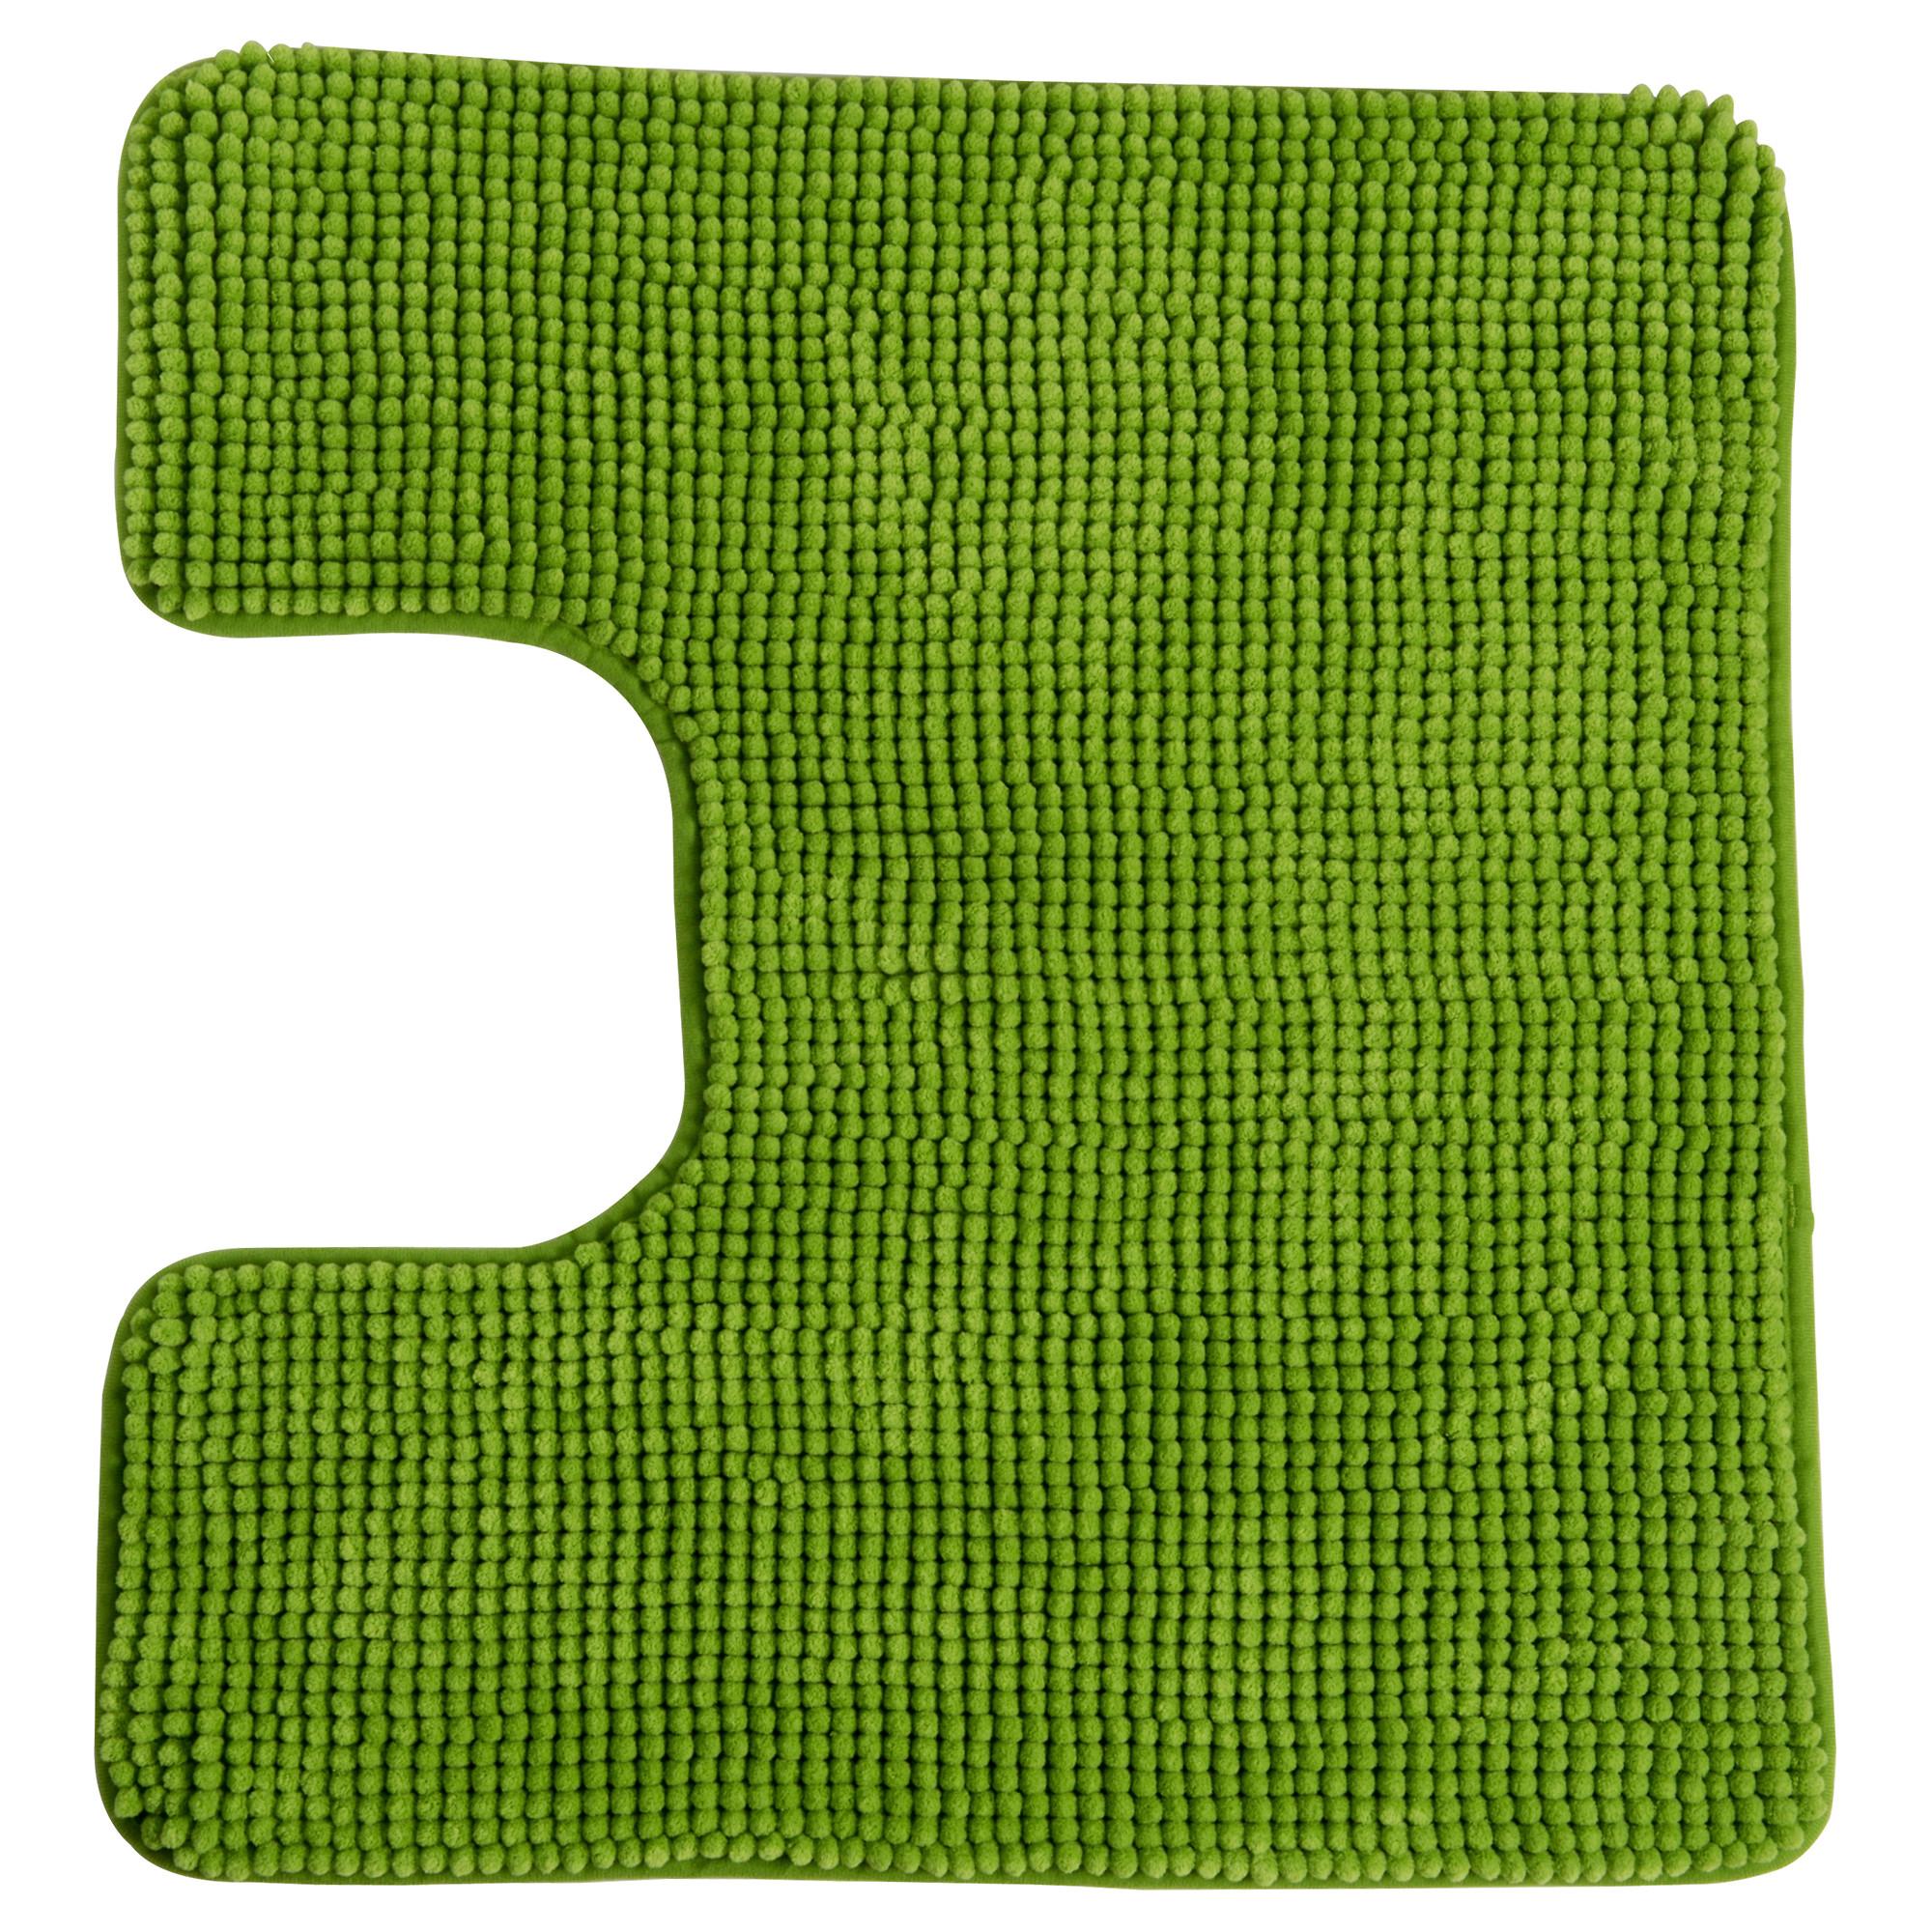 Коврик в туалет ТОФТБУ зеленый артикуль № 603.801.63 в наличии. Онлайн каталог IKEA РБ. Недорогая доставка и монтаж.